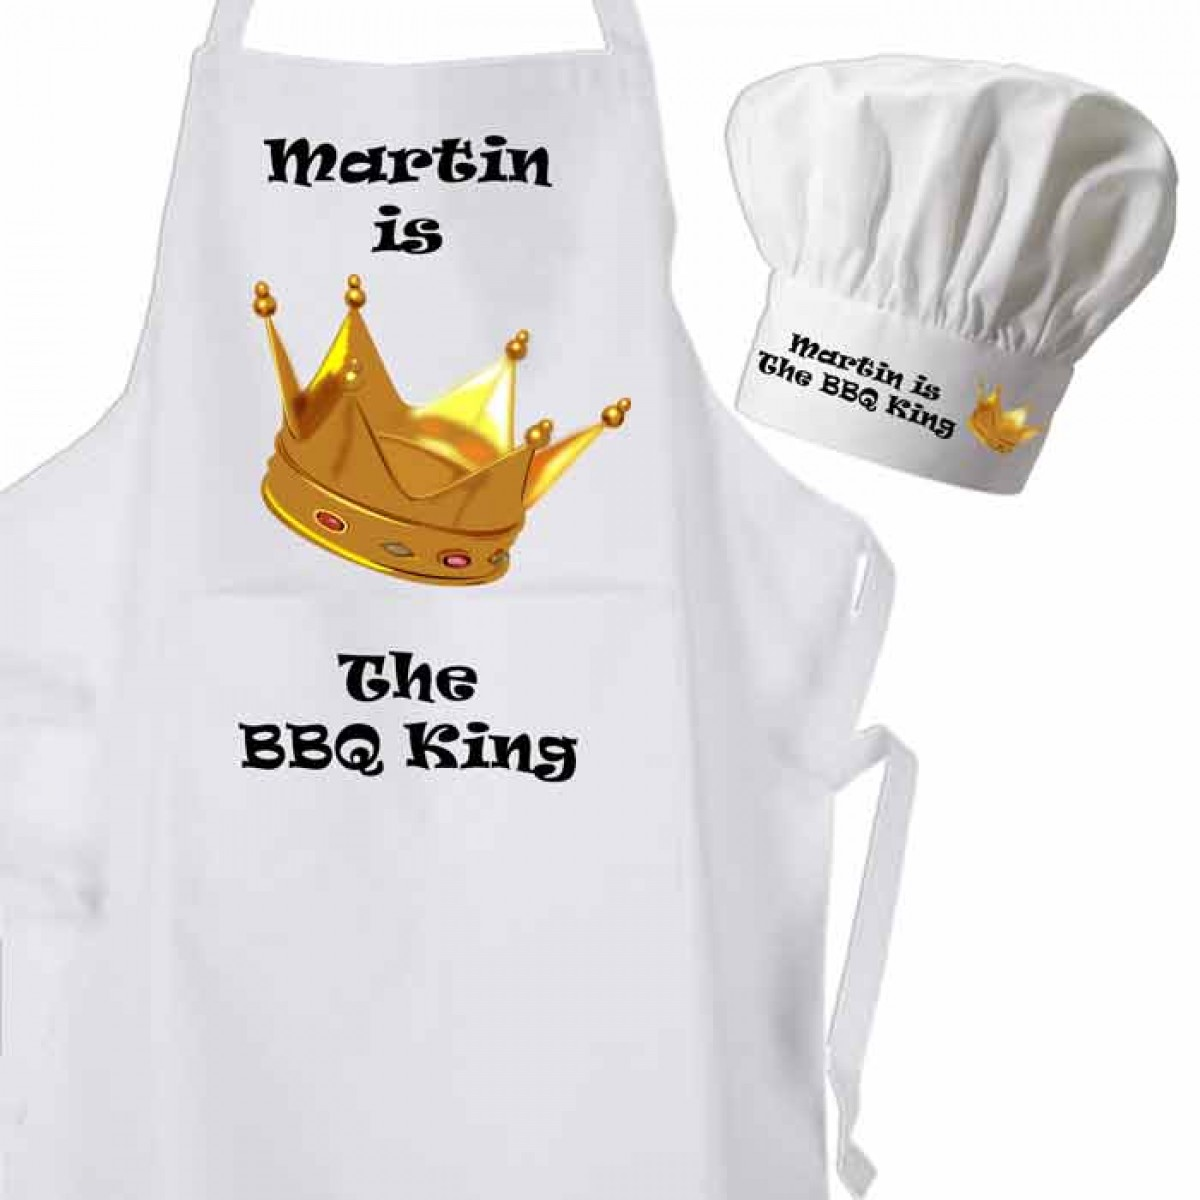 White apron and chef hat - White Apron And Chef Hat 29